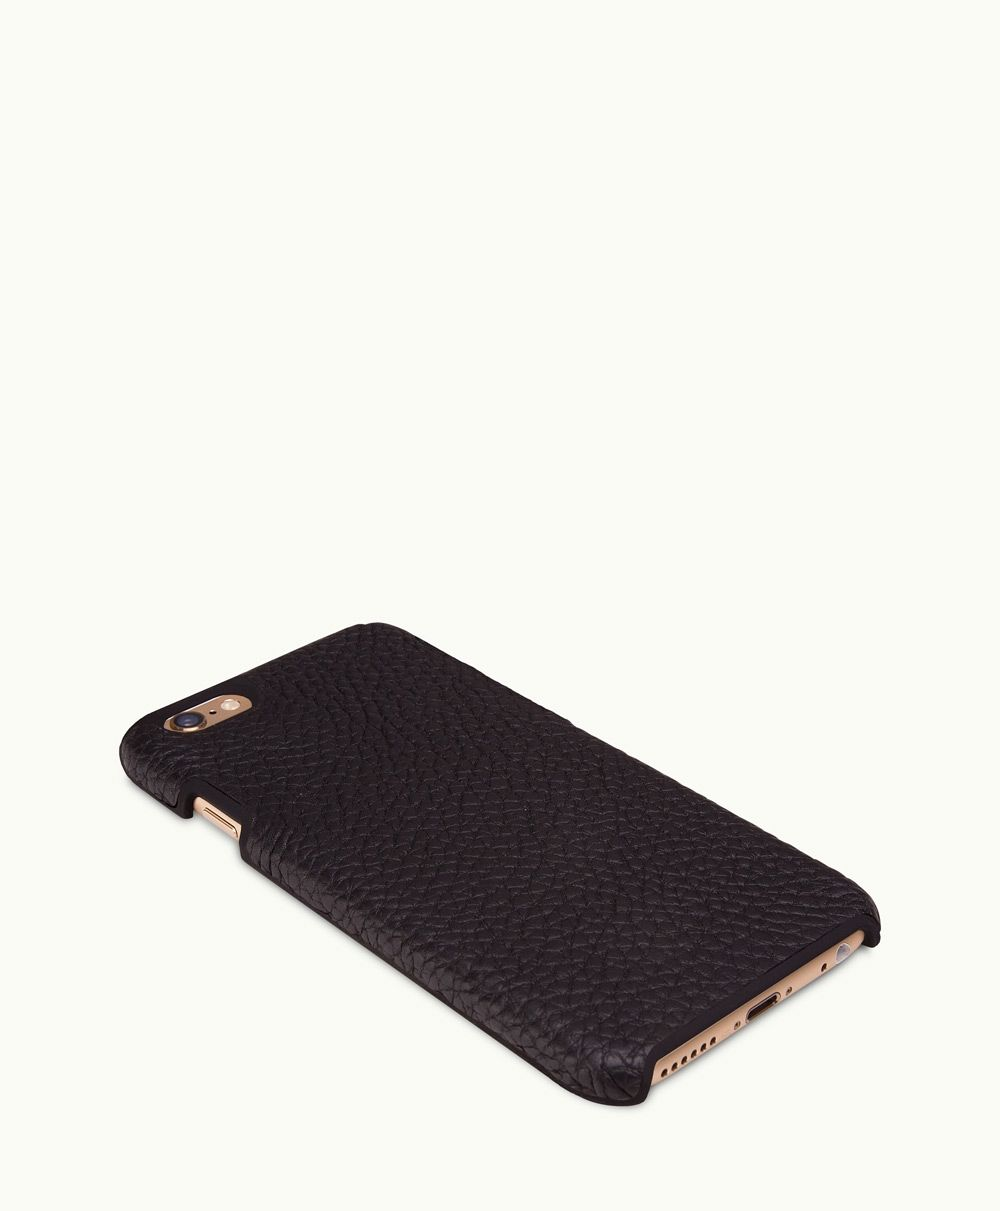 e232b3bb4a112 iPhone 6 6s Hard-Shell Case Black Pebble Grain